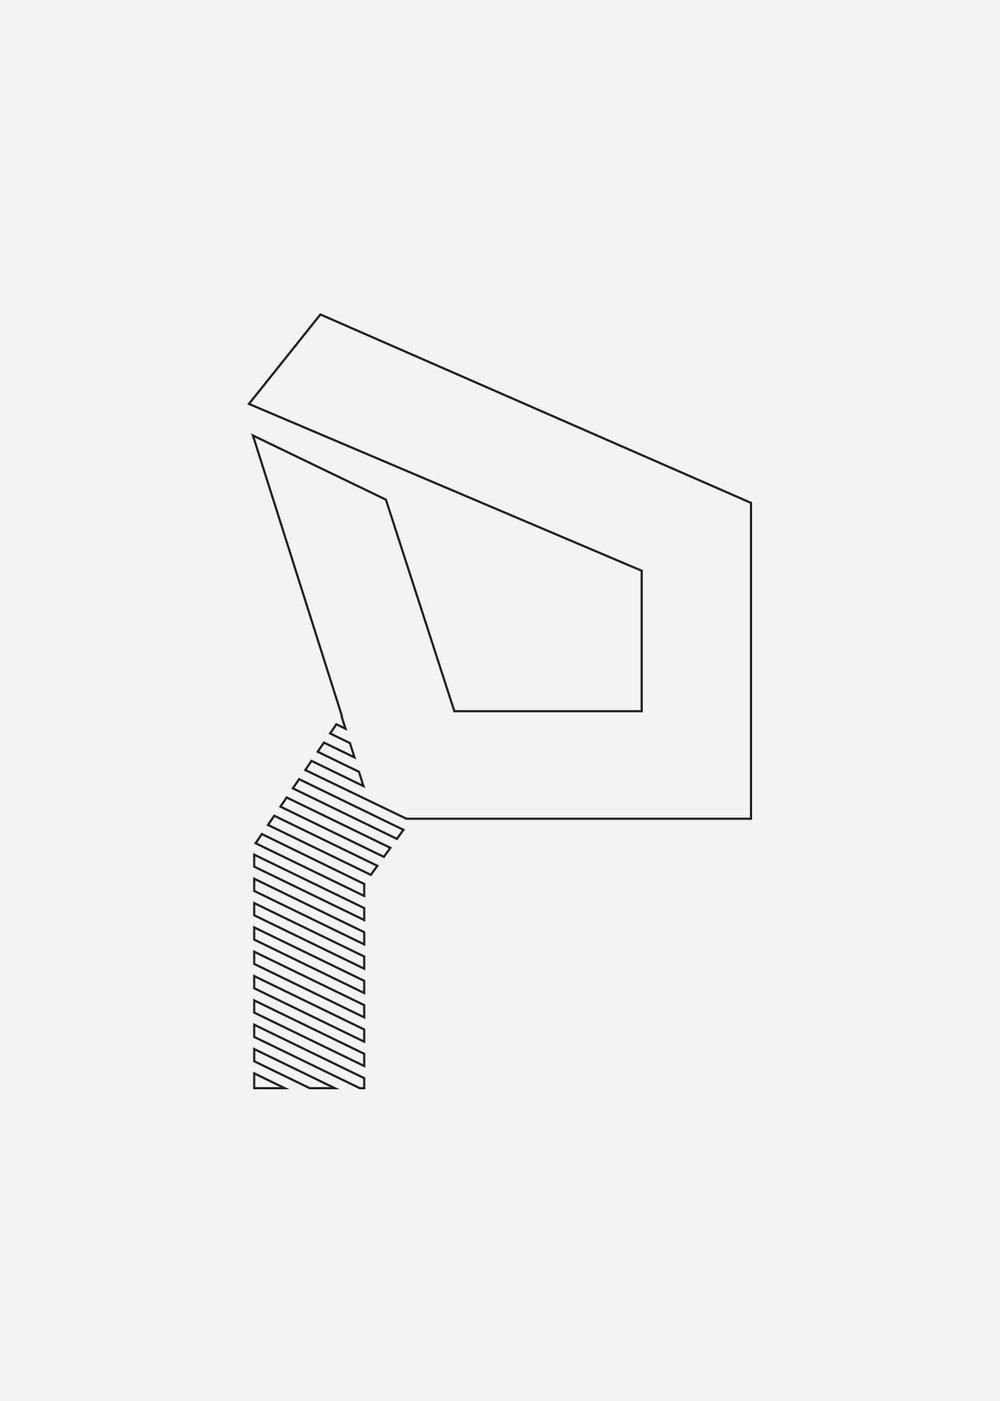 Detail 02 — Letter P (Second floor overhang)